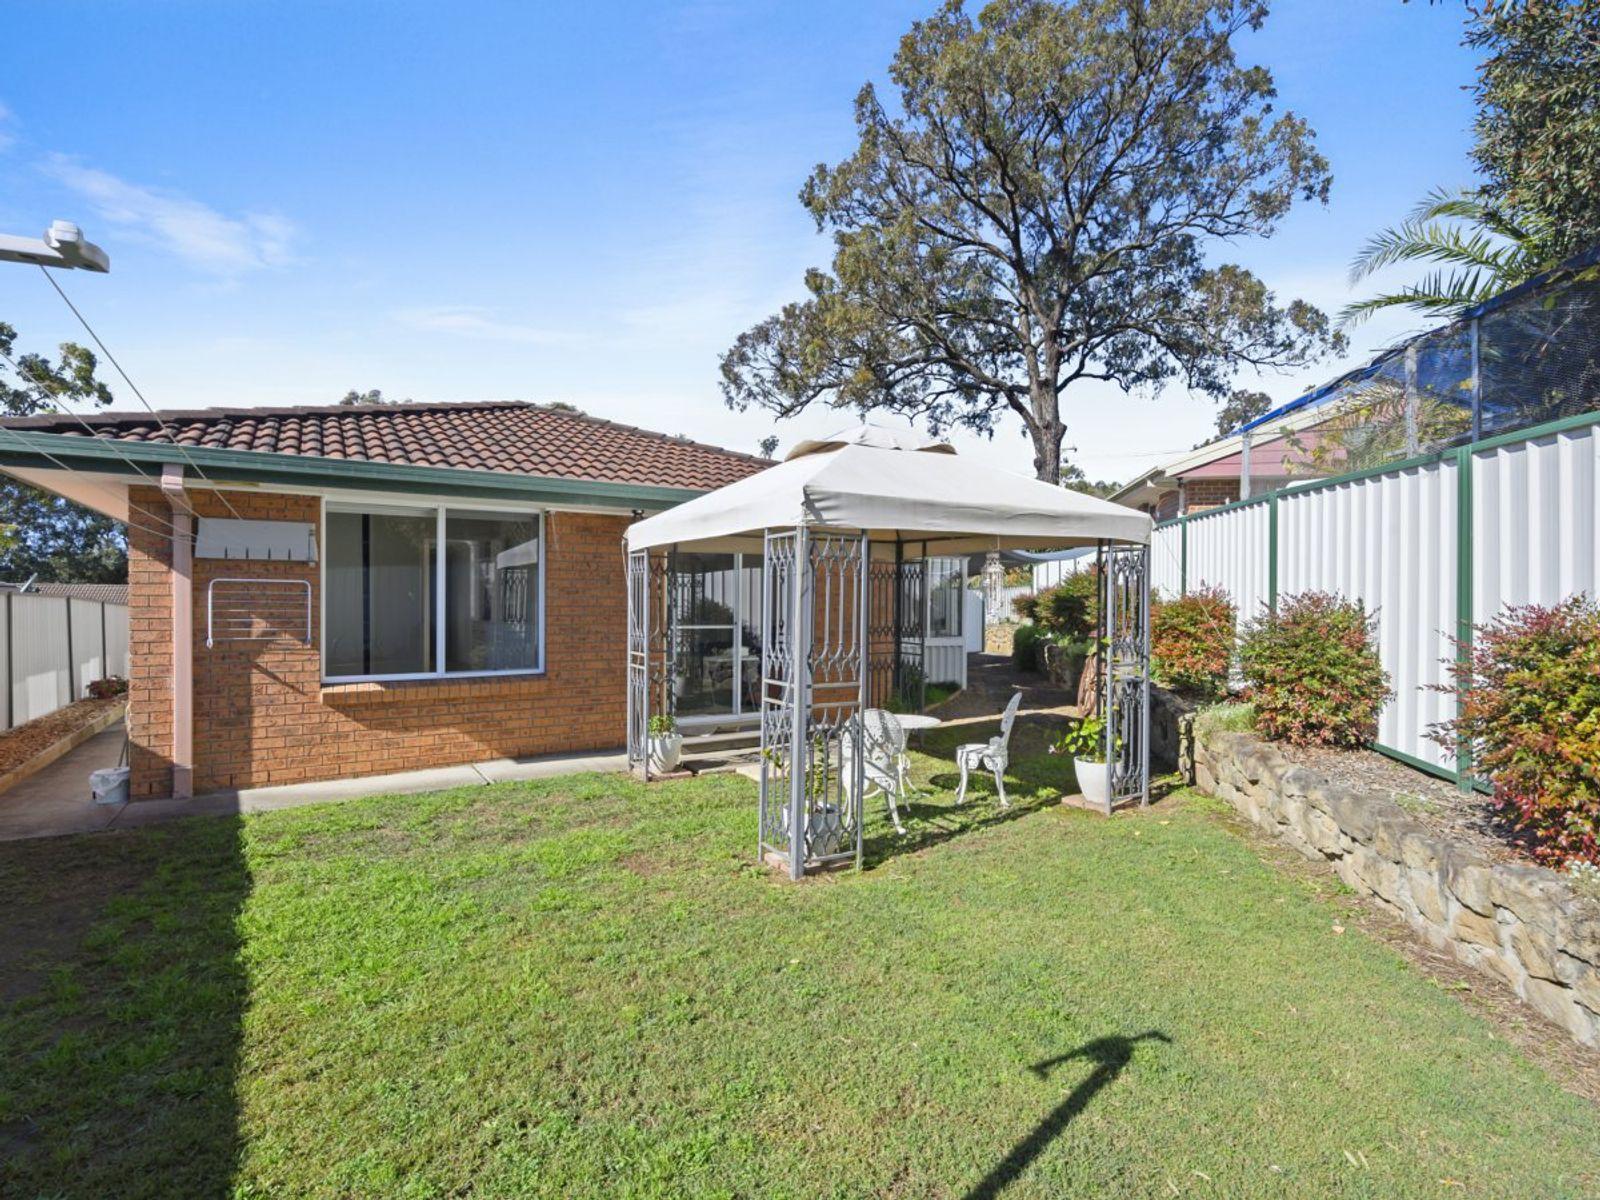 14 Golf Links Drive, Watanobbi, NSW 2259